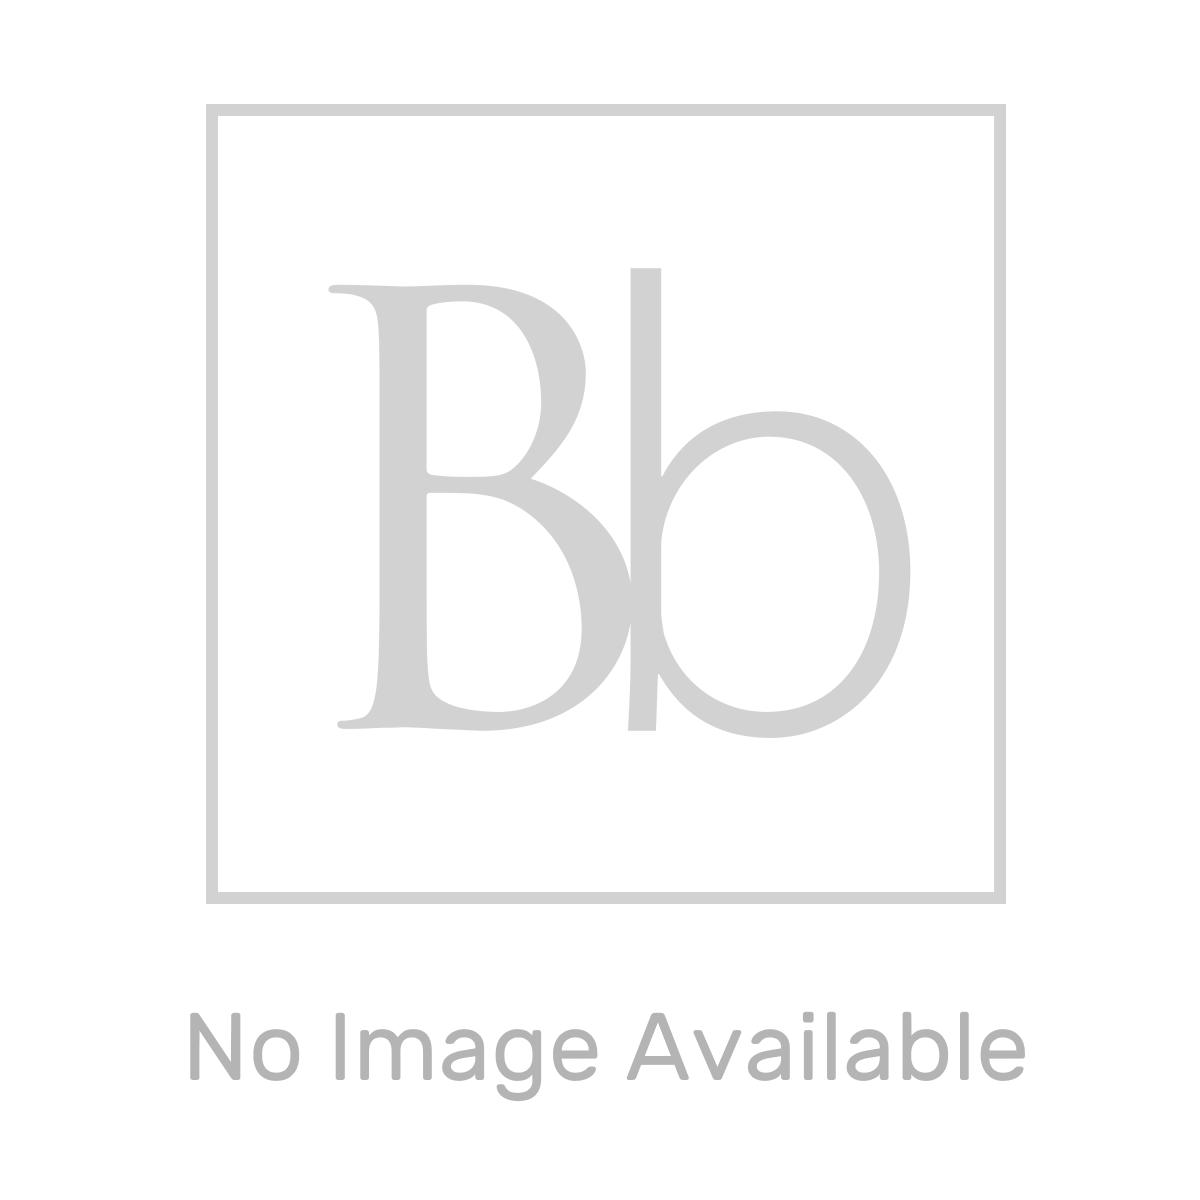 RAK Cubis Black Towel Rail Measurements